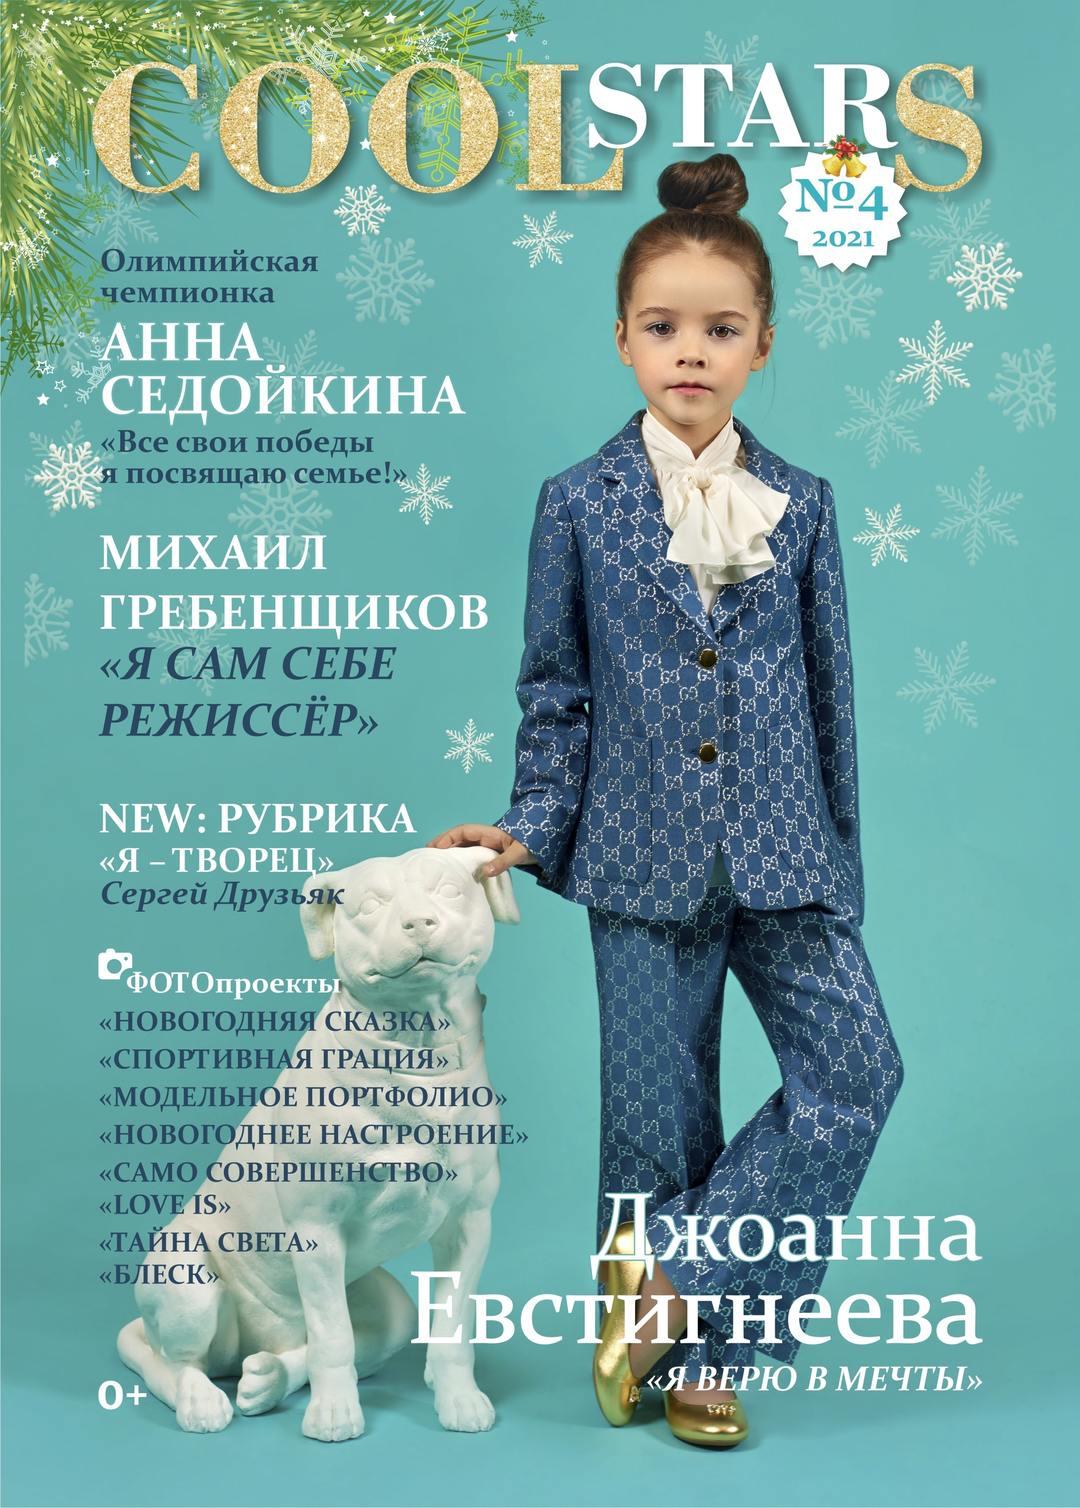 Заказать журнал Coolstars